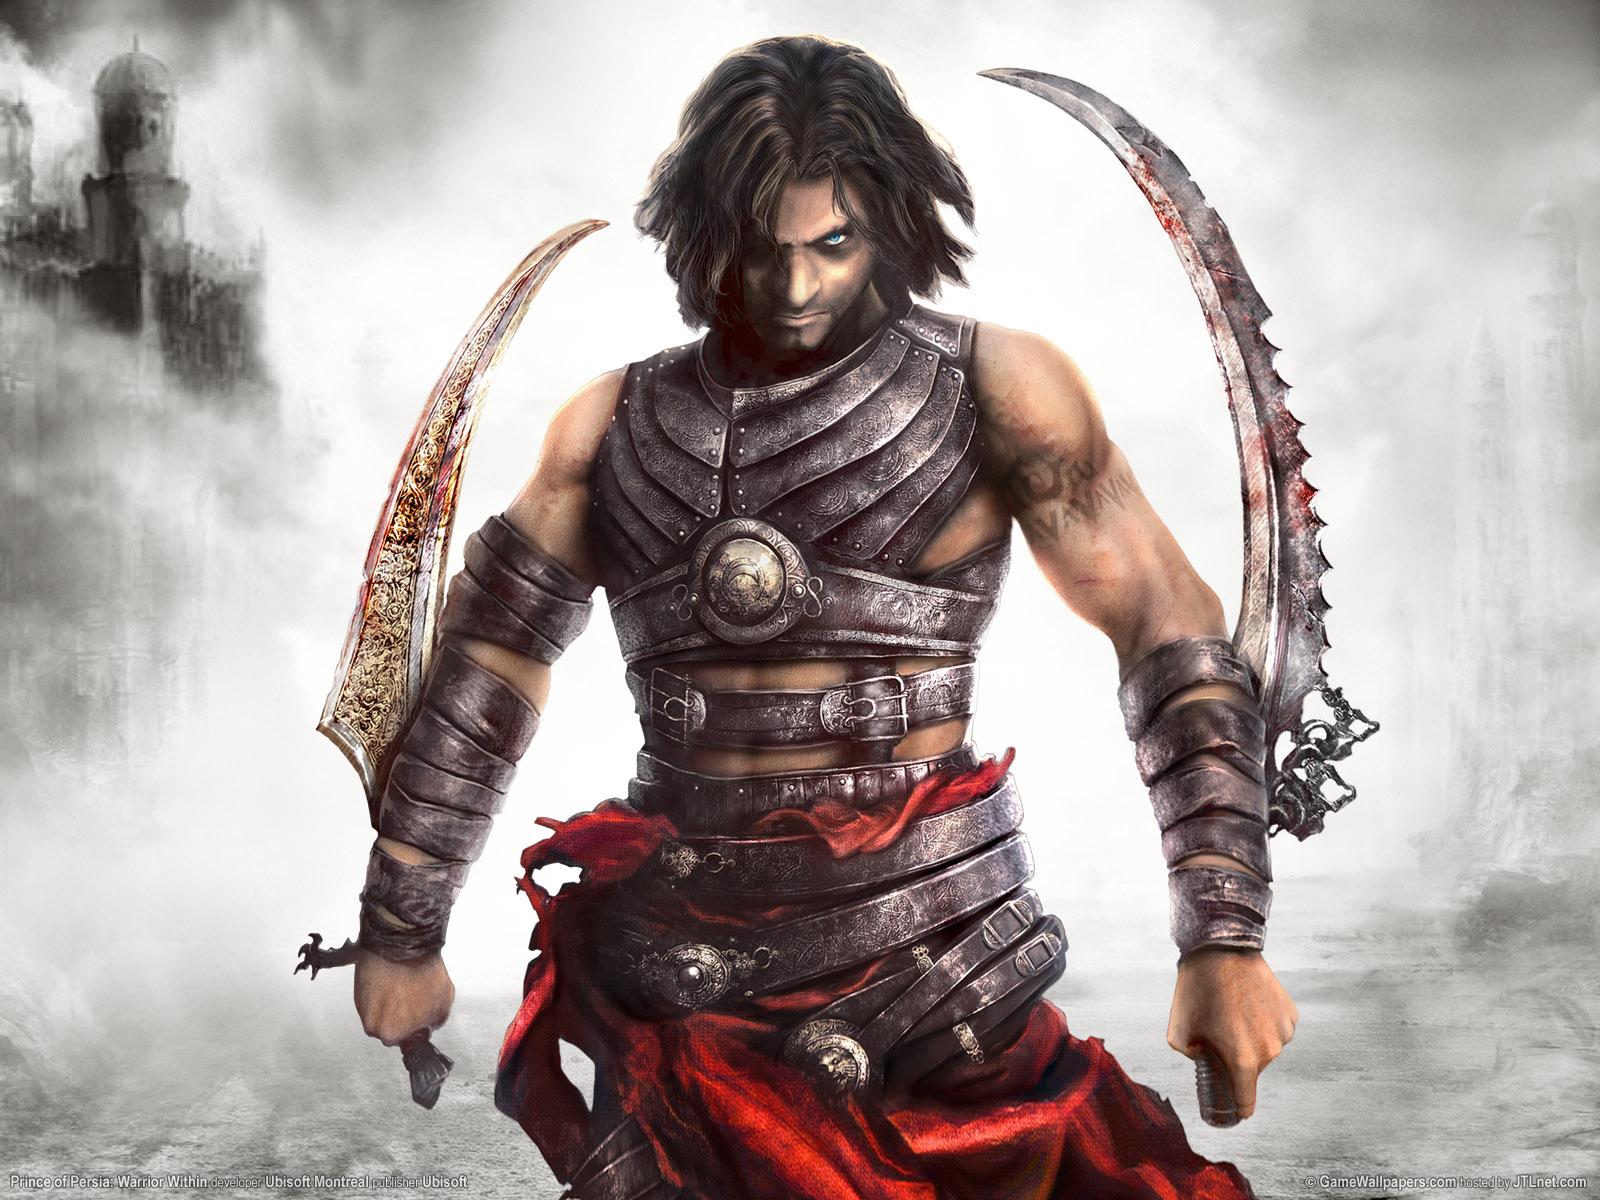 http://2.bp.blogspot.com/_UkhVTq3r2RM/TAYzRA8qy1I/AAAAAAAAAG8/IvpbEDLnOx0/s1600/wallpaper_prince_of_persia_warrior_within_10_1600.jpg